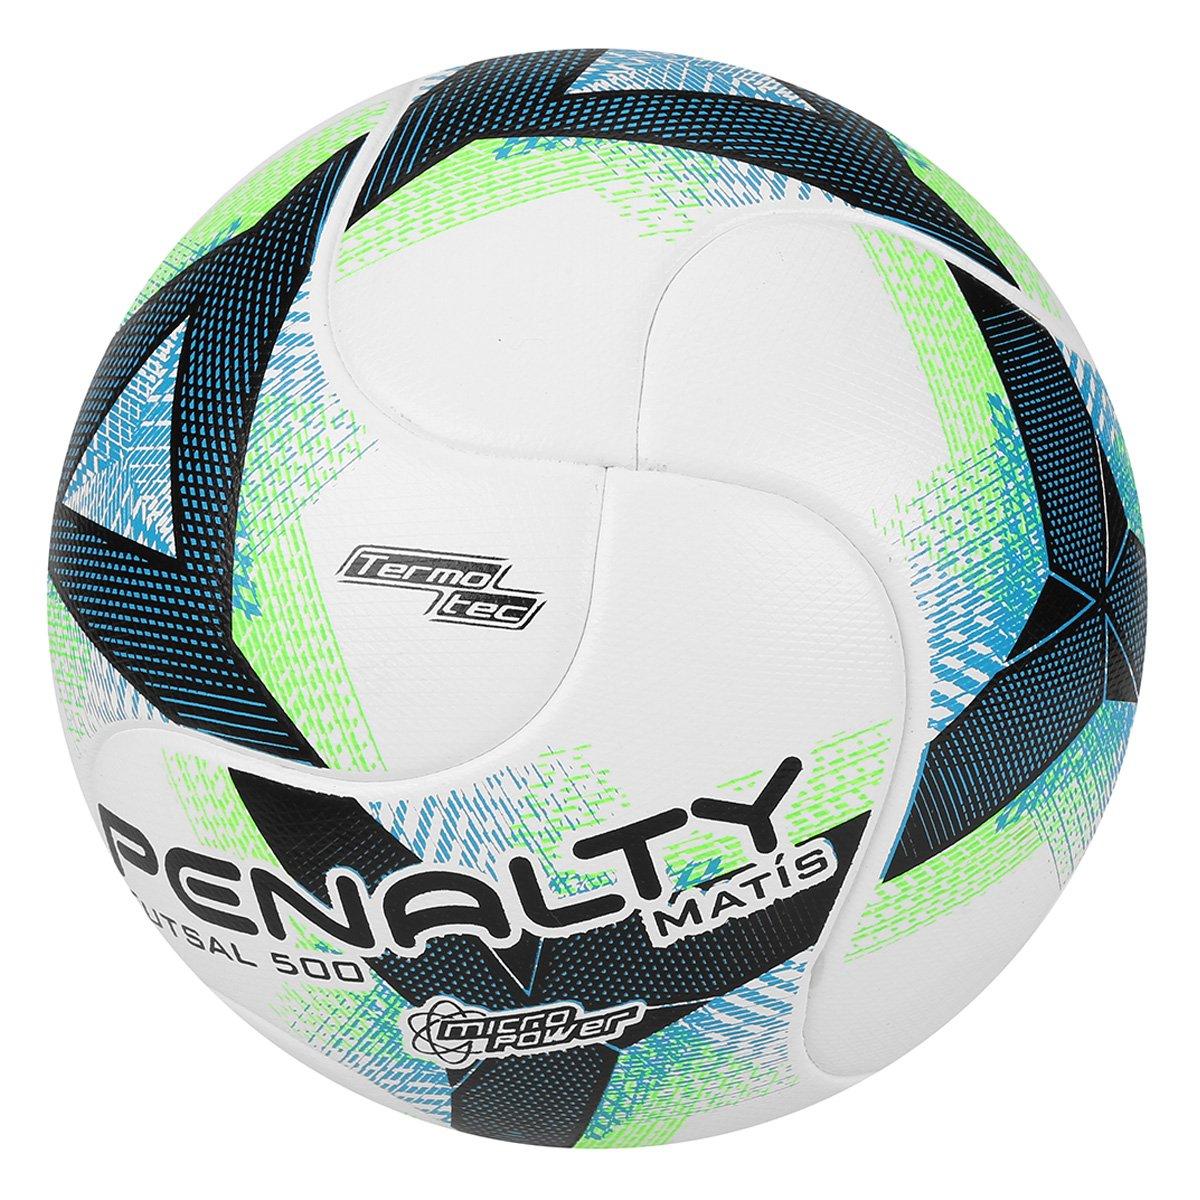 Bola Futsal Penalty Matis 500 Termotec VIII - Branco e Verde ... f053ef0ab70be